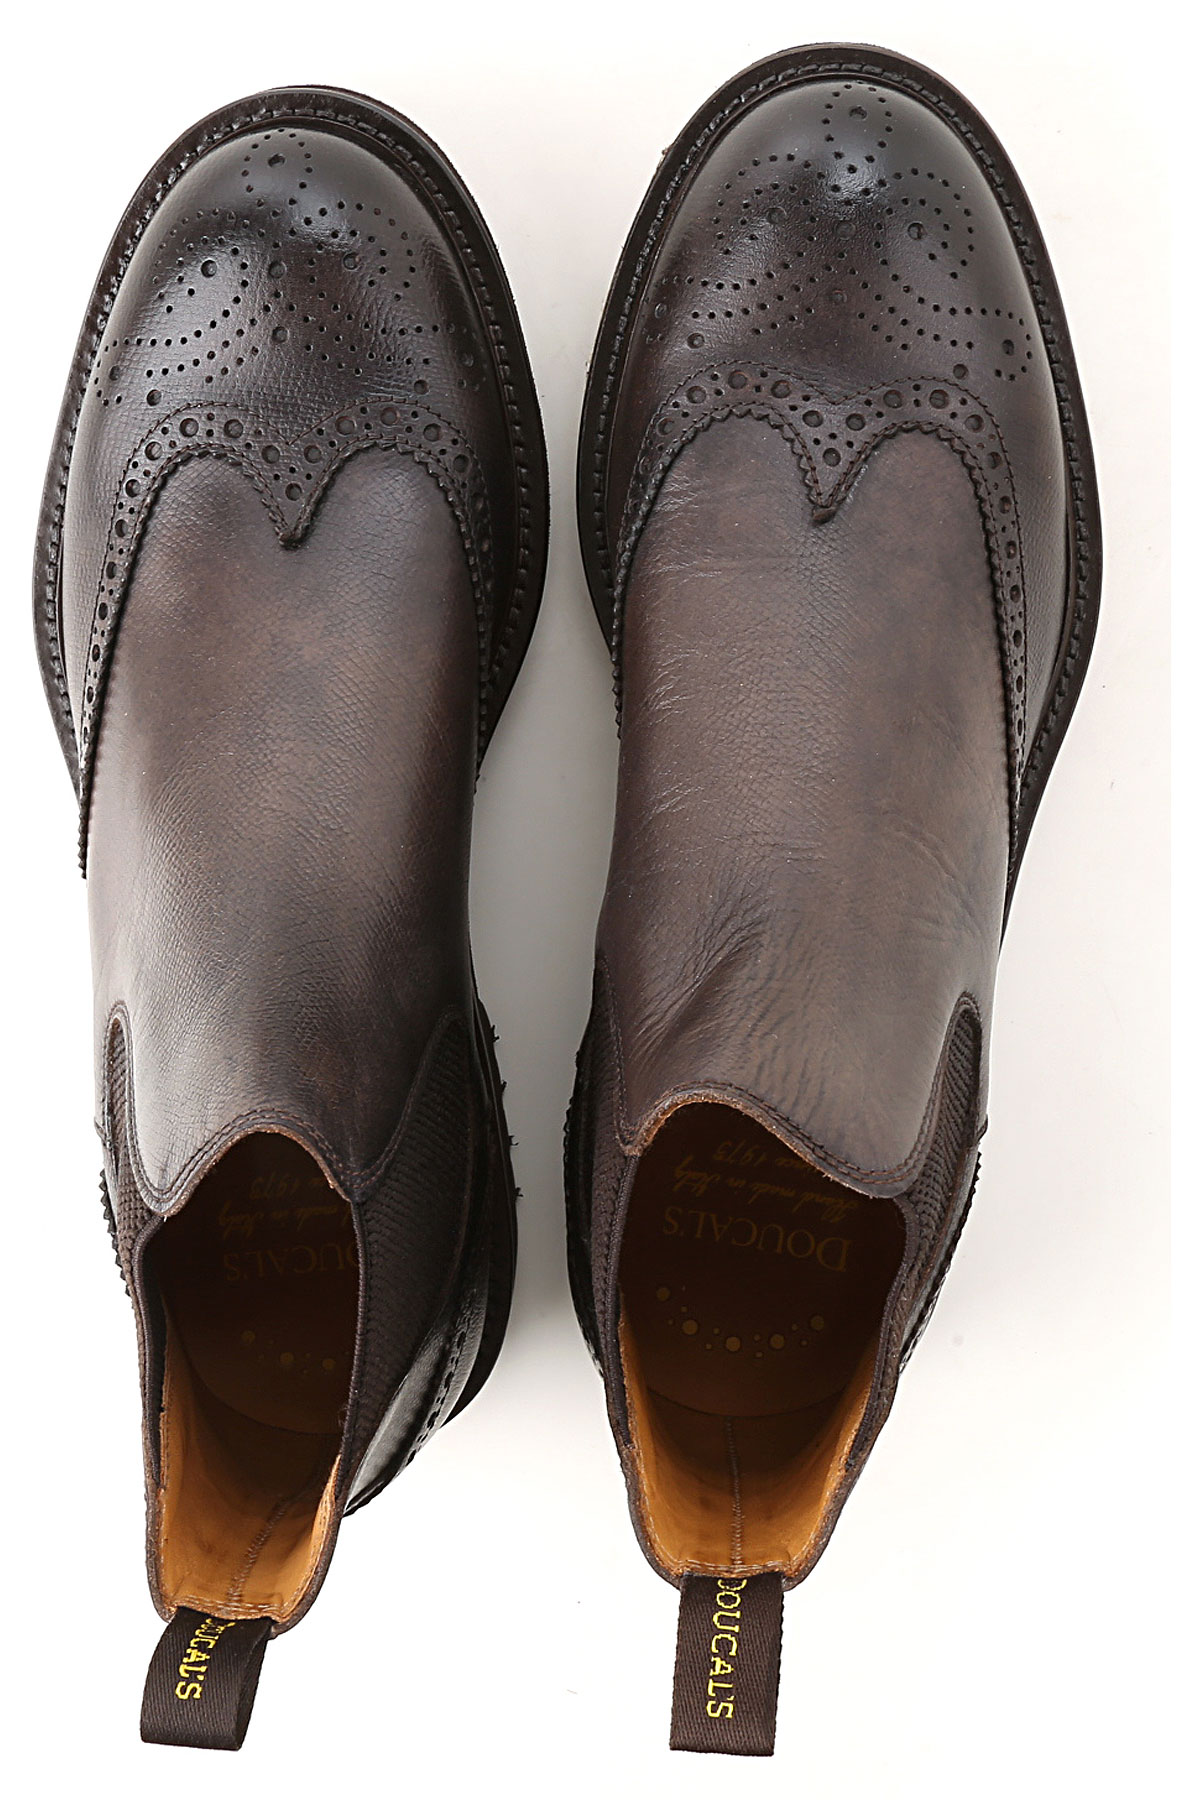 Para nbsp; Zapatos 2018 Otoño invierno Landed Hombres 19 Doucals 6qF5TCwC